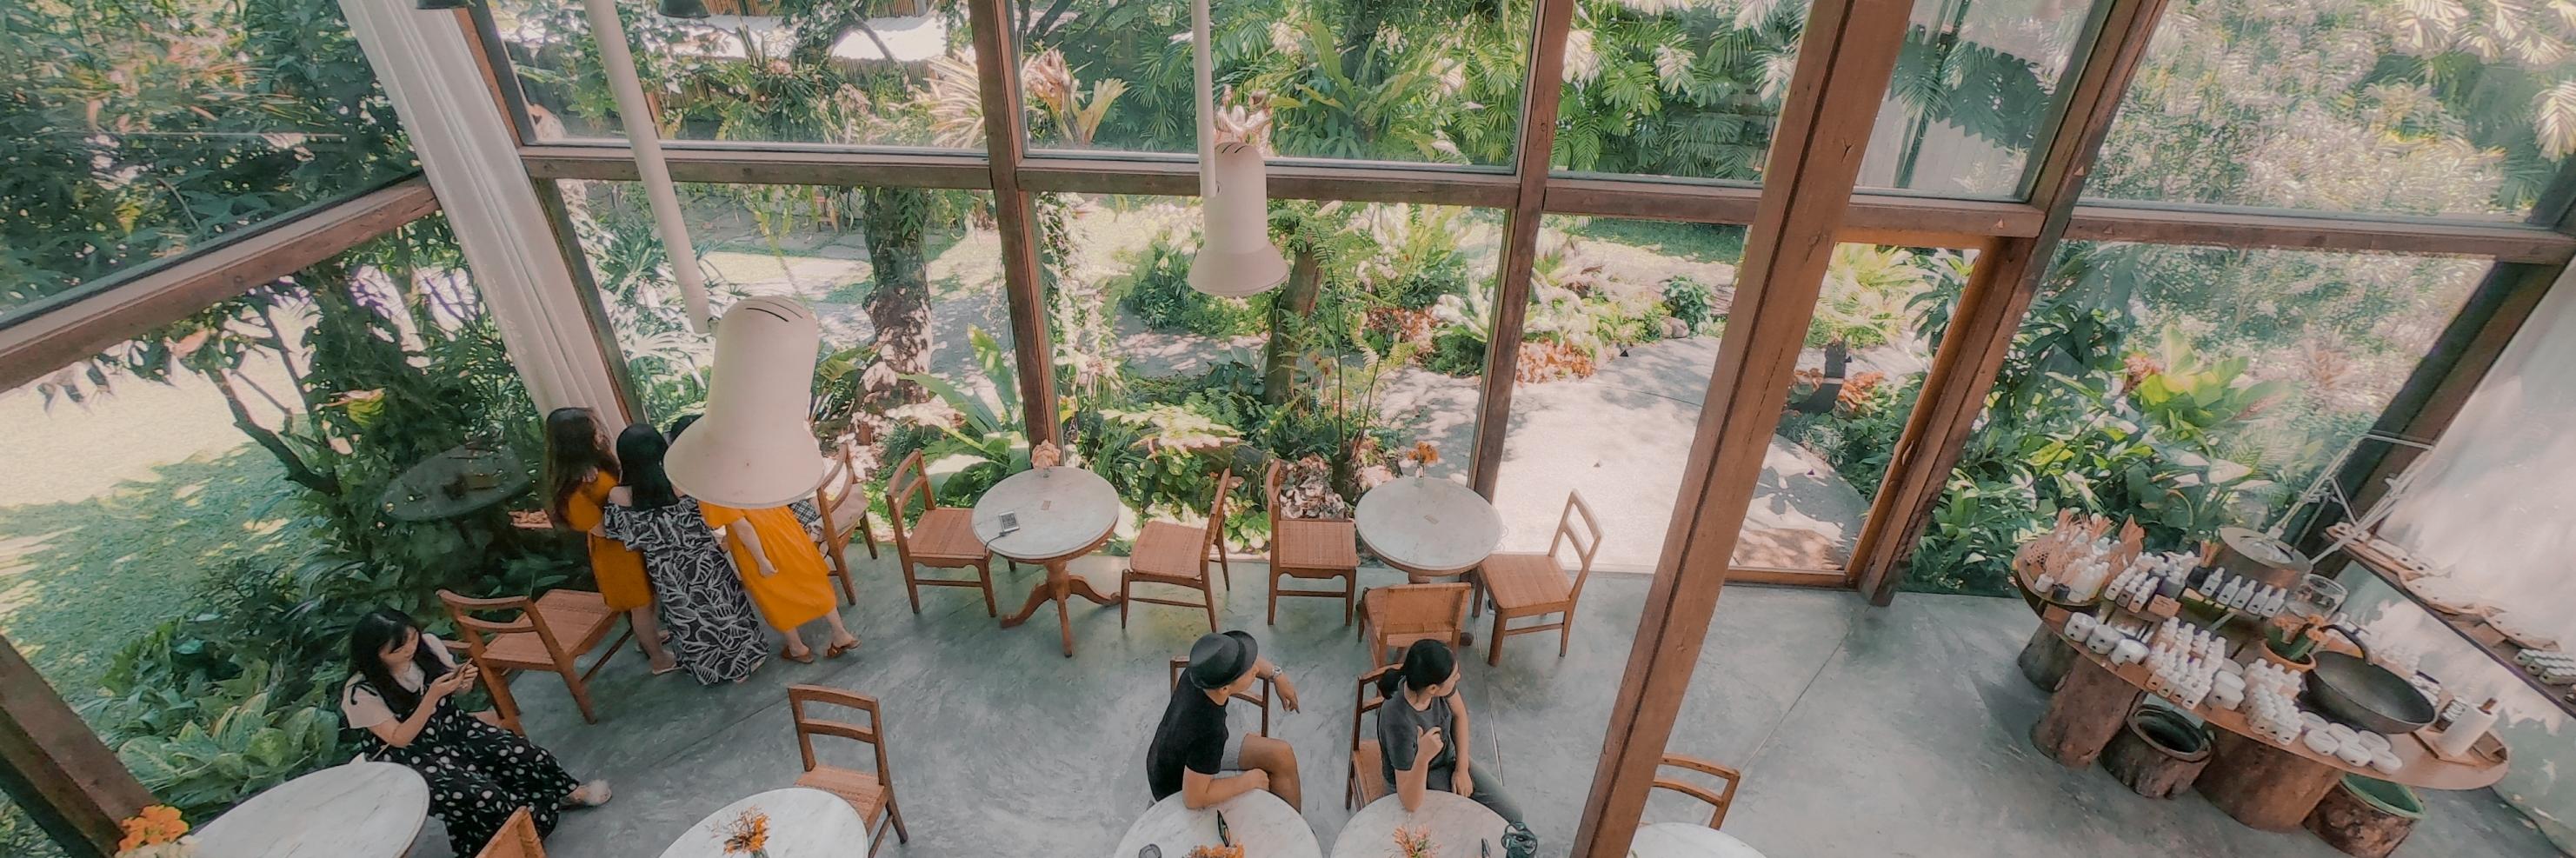 https://gody.vn/blog/tuananhhunre9193/post/quan-coffee-xanh-giua-long-bangkok-5215